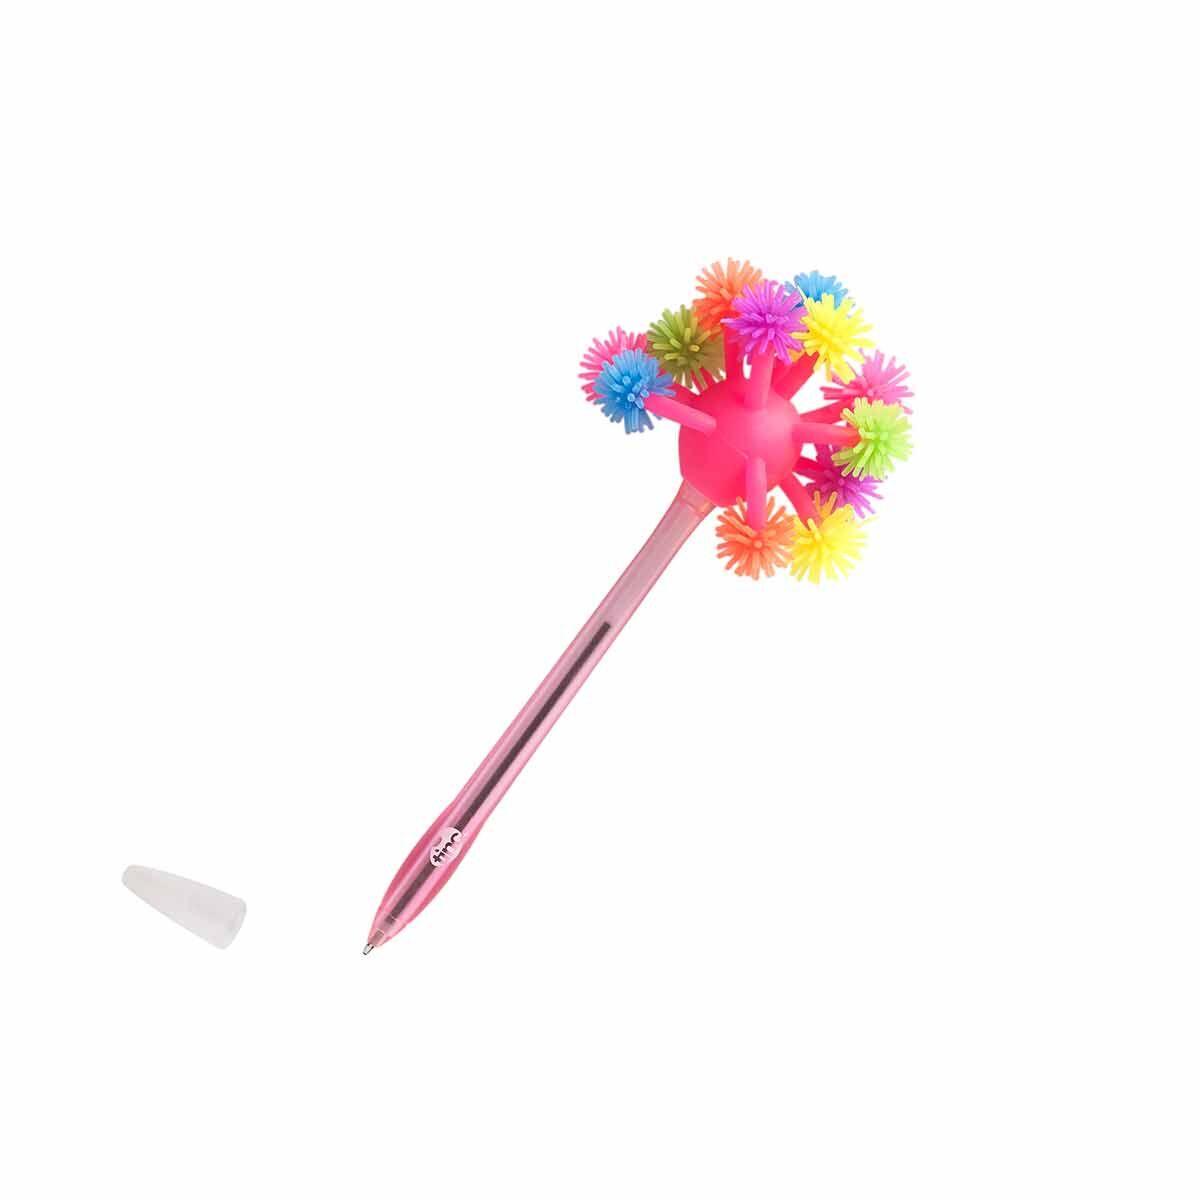 Tinc Multi-Fuzzy Pen Pink